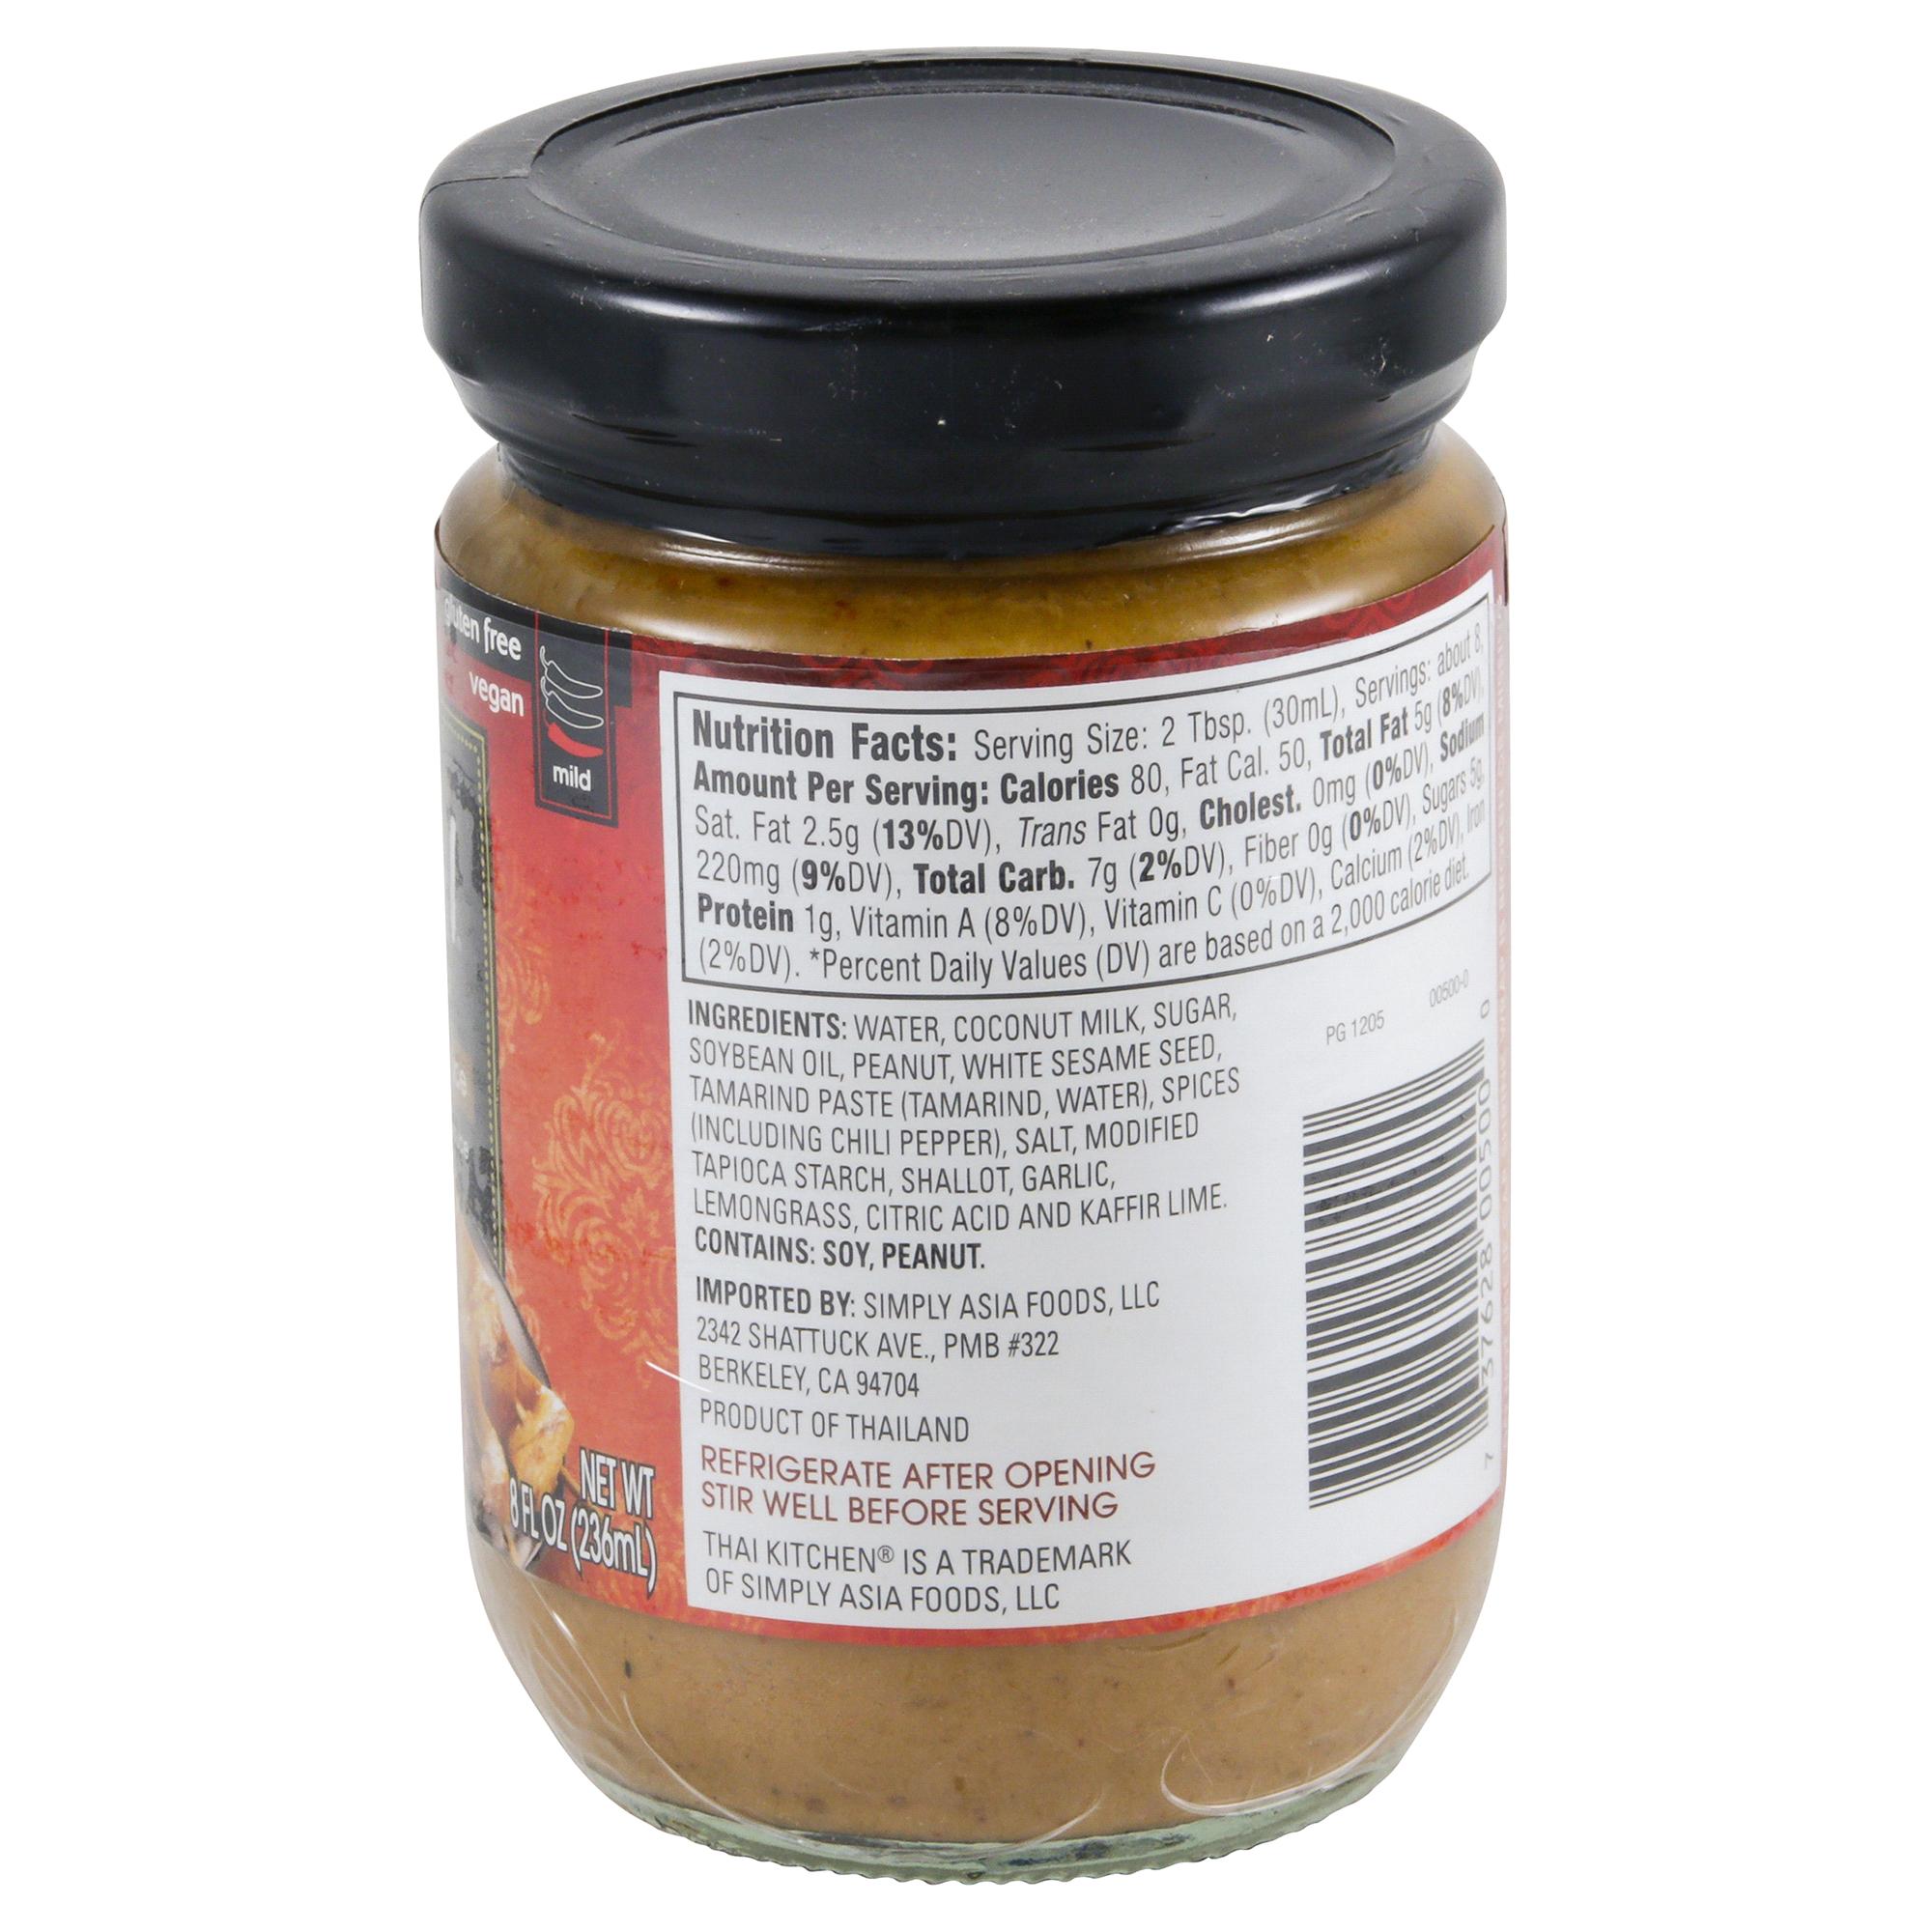 Thai Kitchen Peanut Satay Sauce 8 Oz | Meijer.com